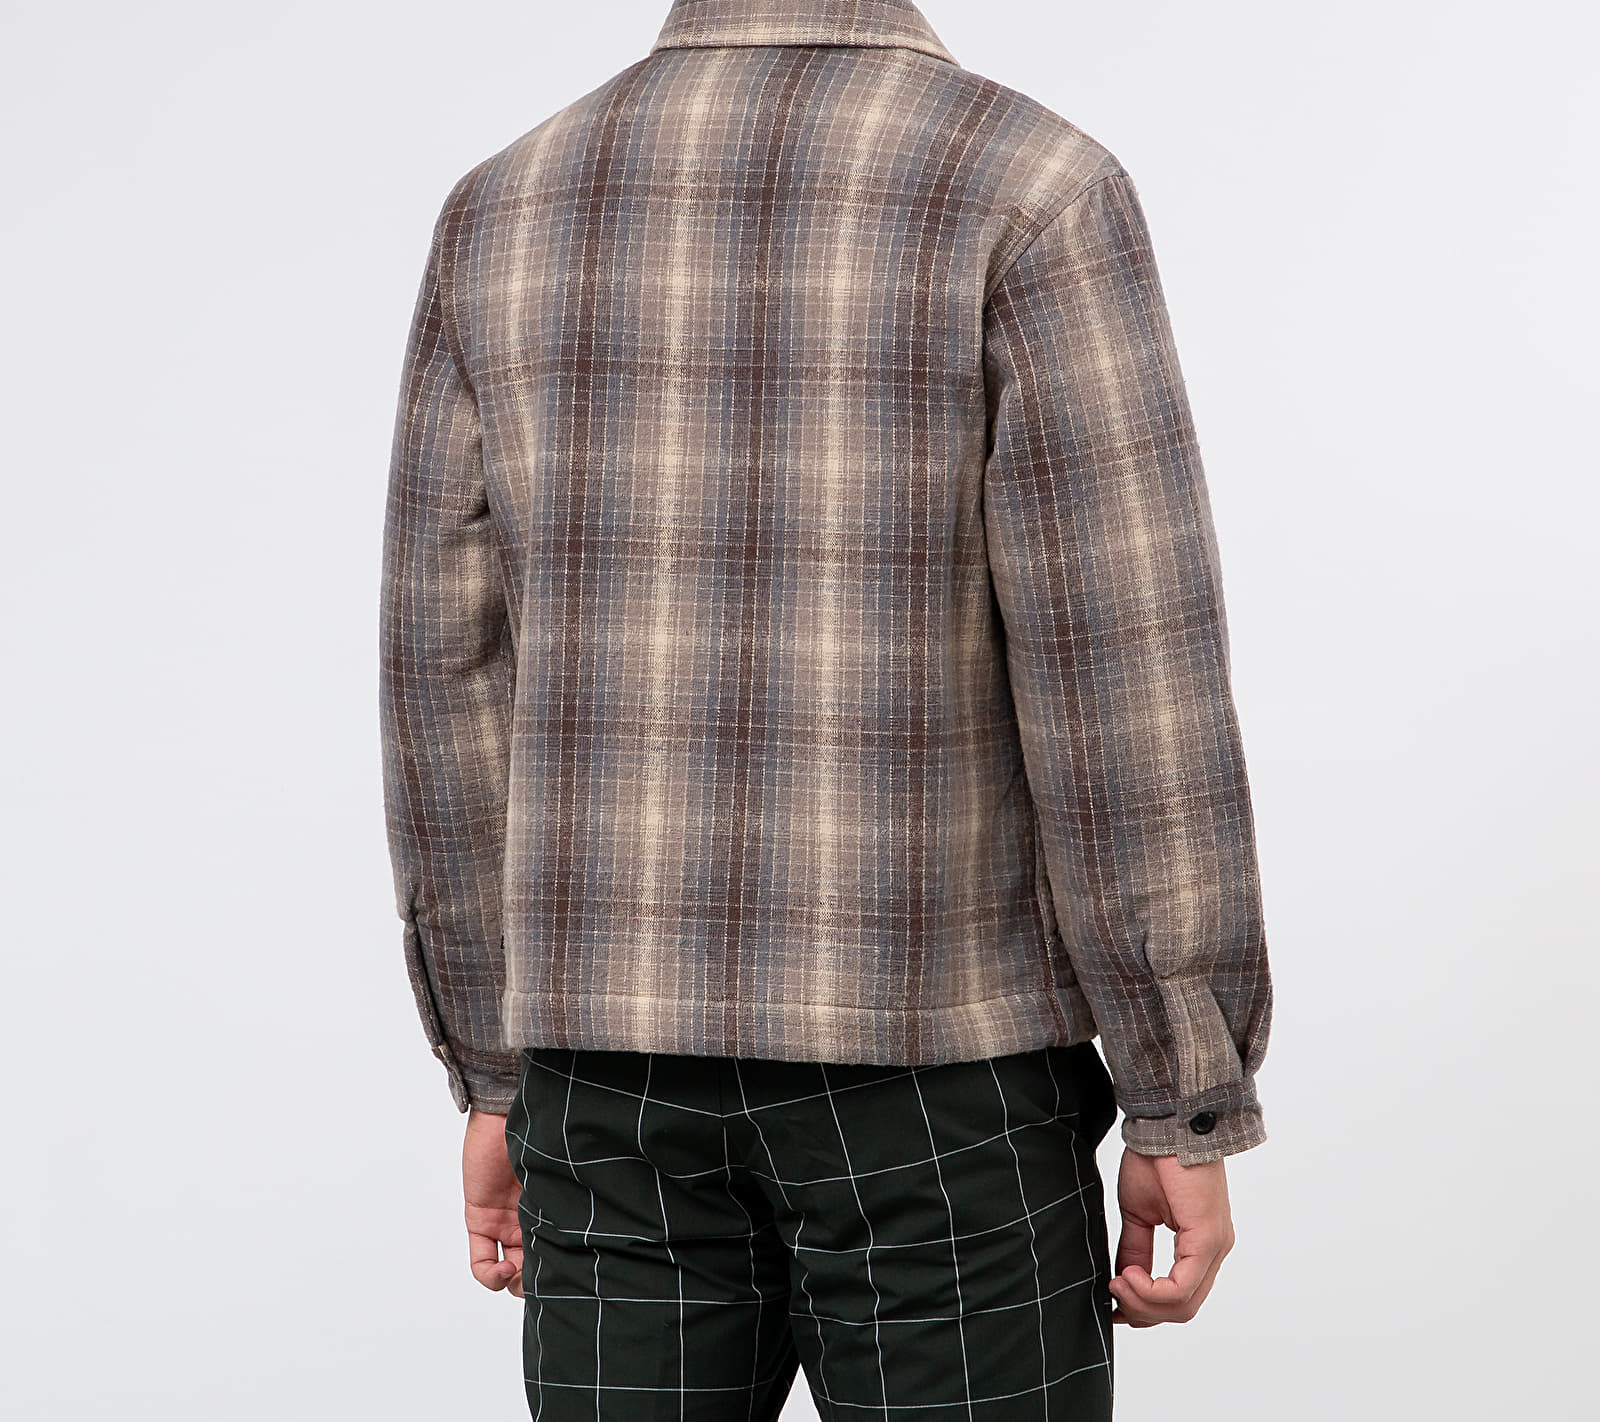 Stüssy Heavy Brush Plaid Zip Up Shirt Jacket Grey, Brown